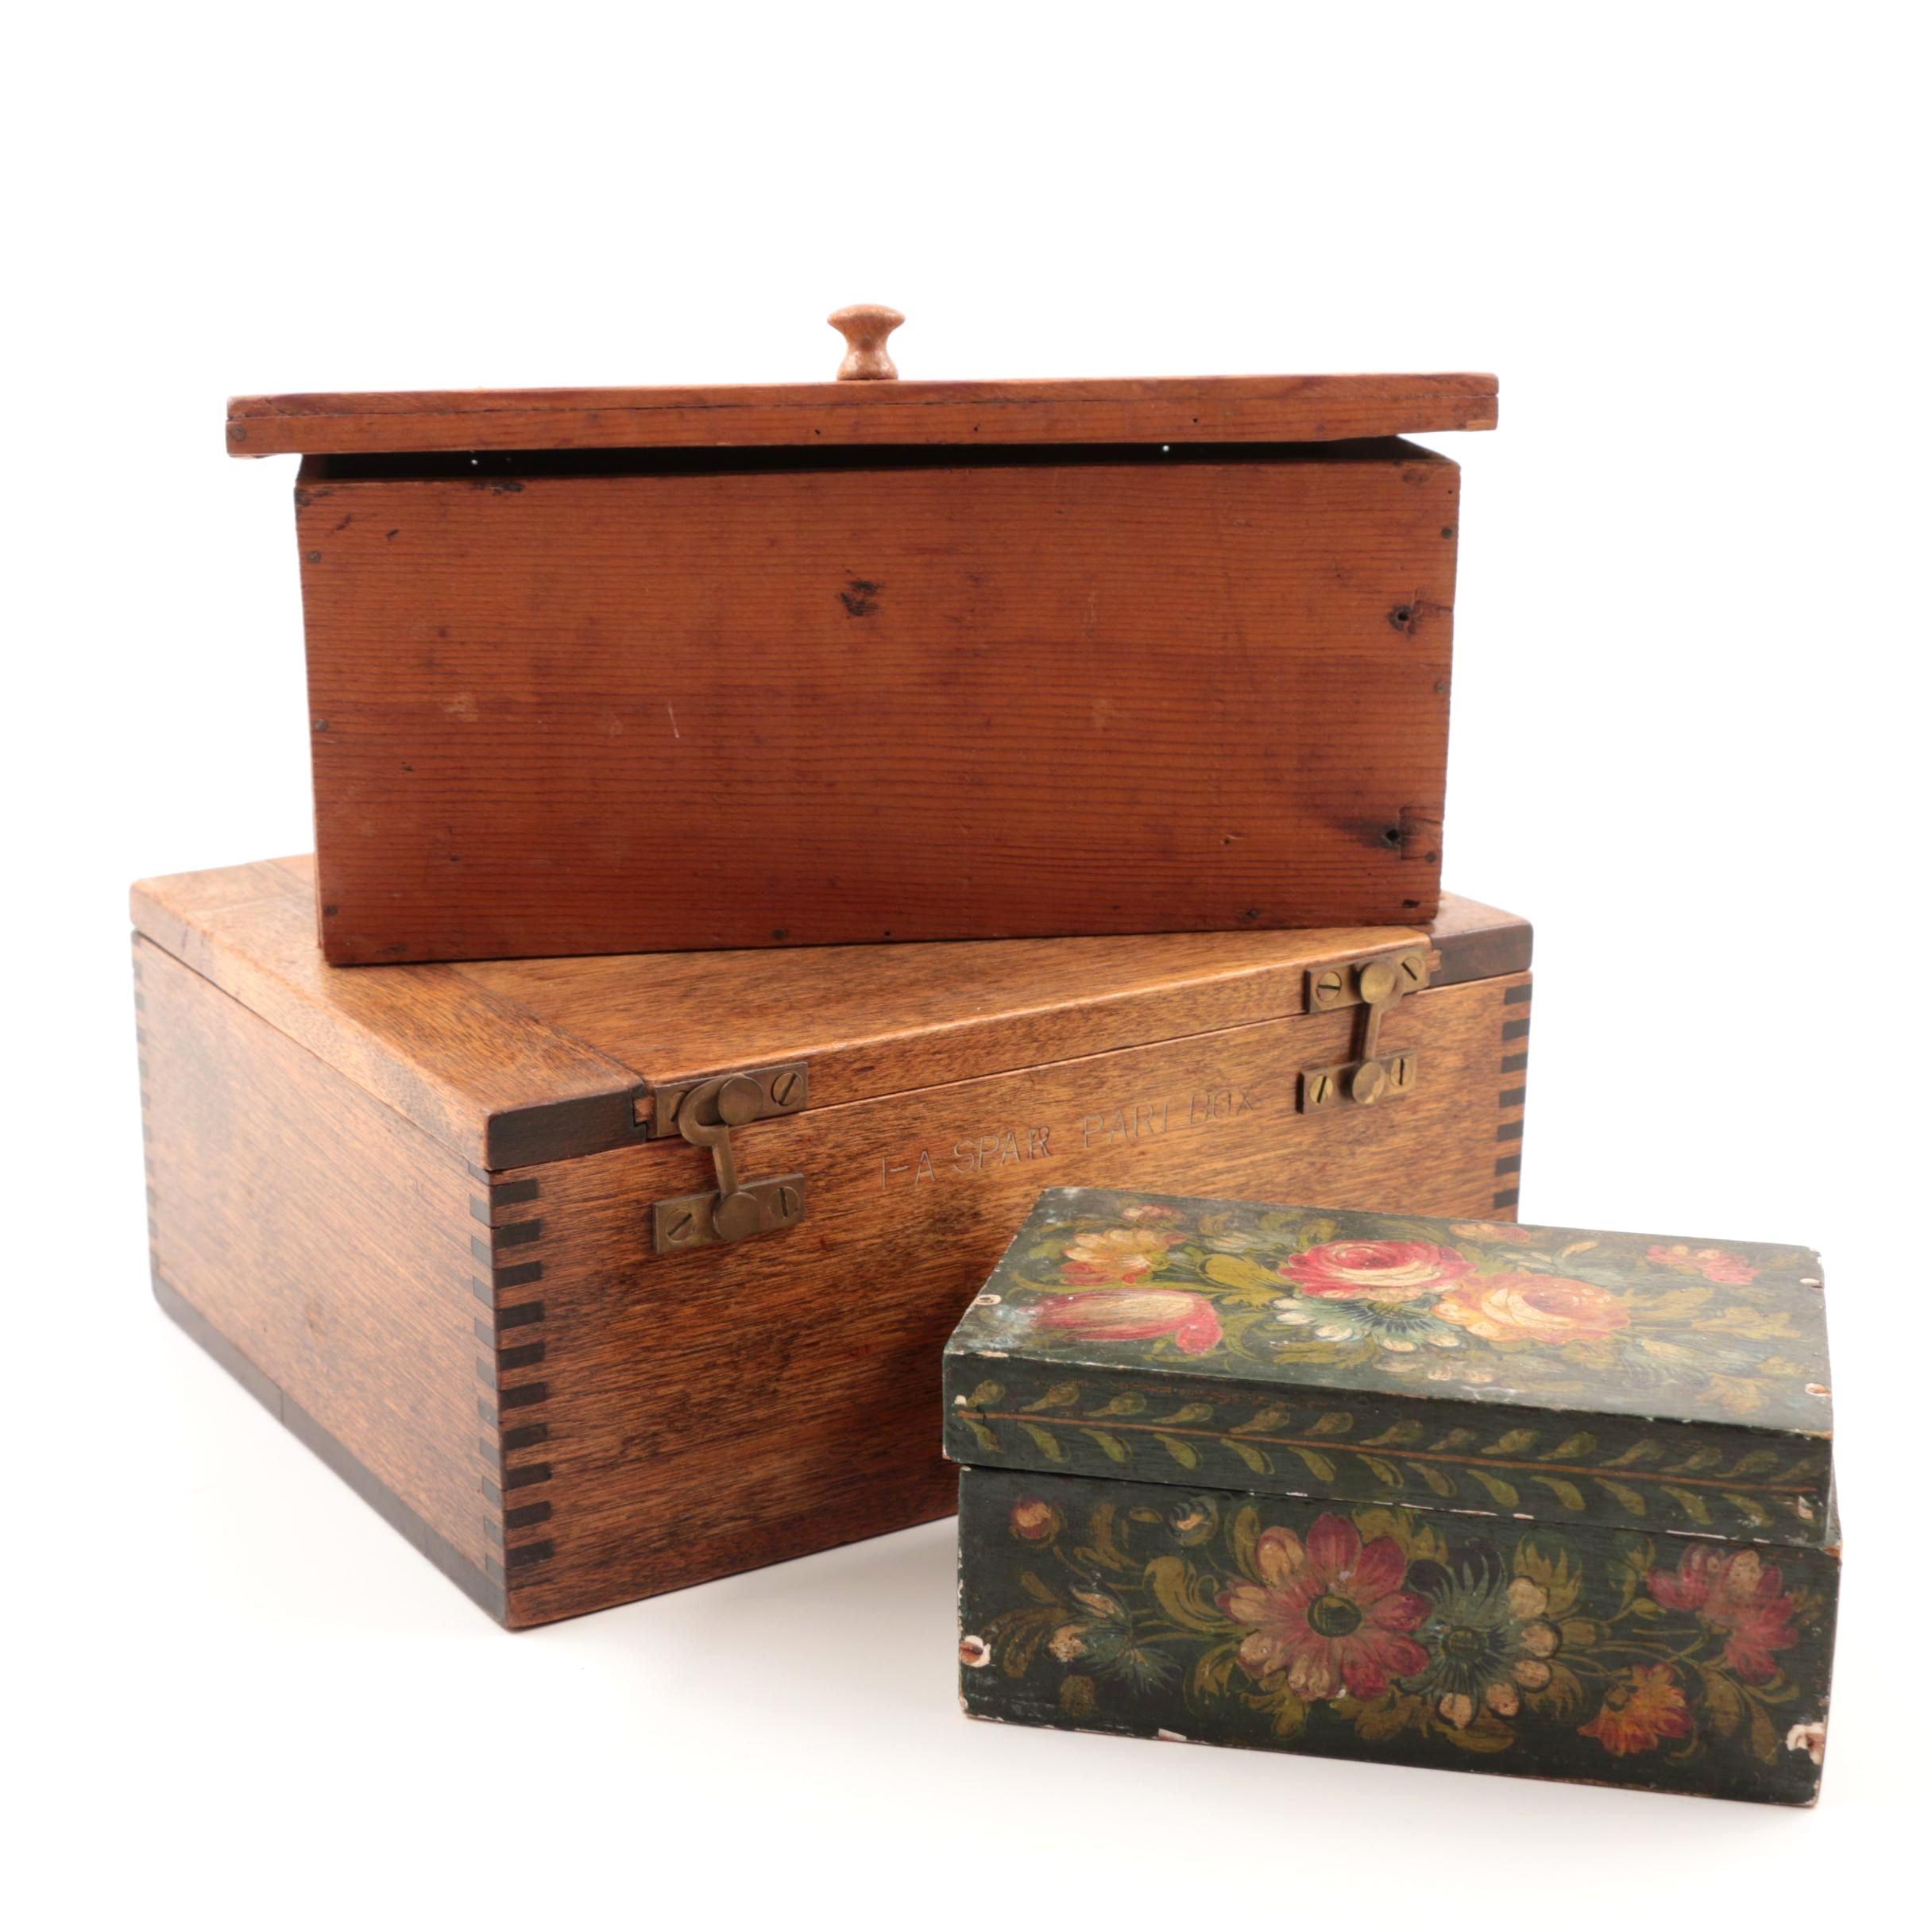 Vintage Handmade Wooden Storage and Trinket Boxes